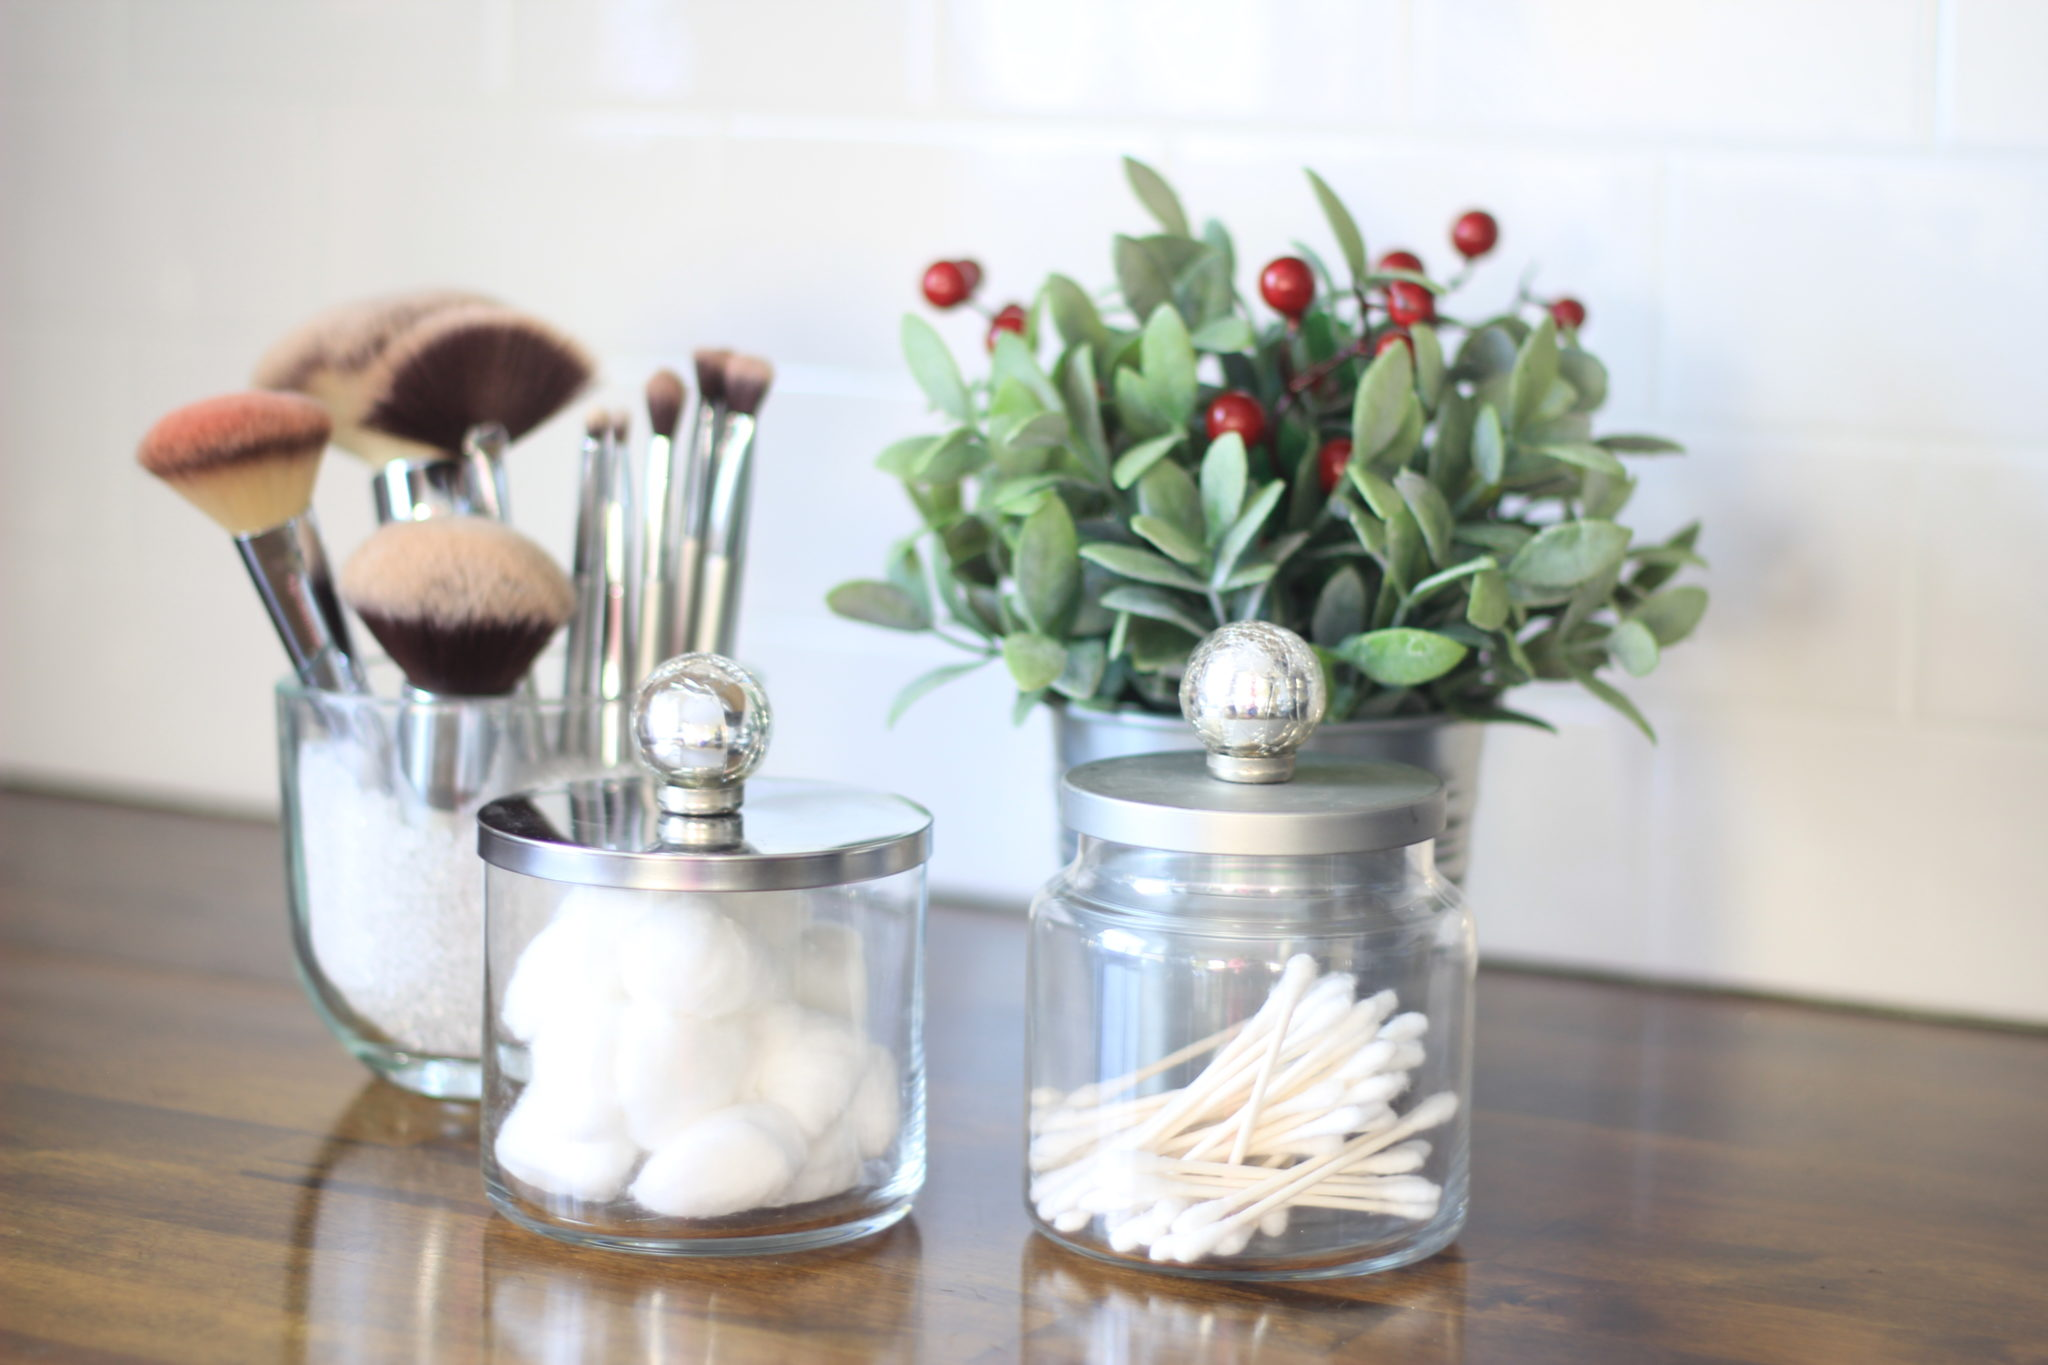 DIY Bathroom Organization Containers - Craftivity Designs